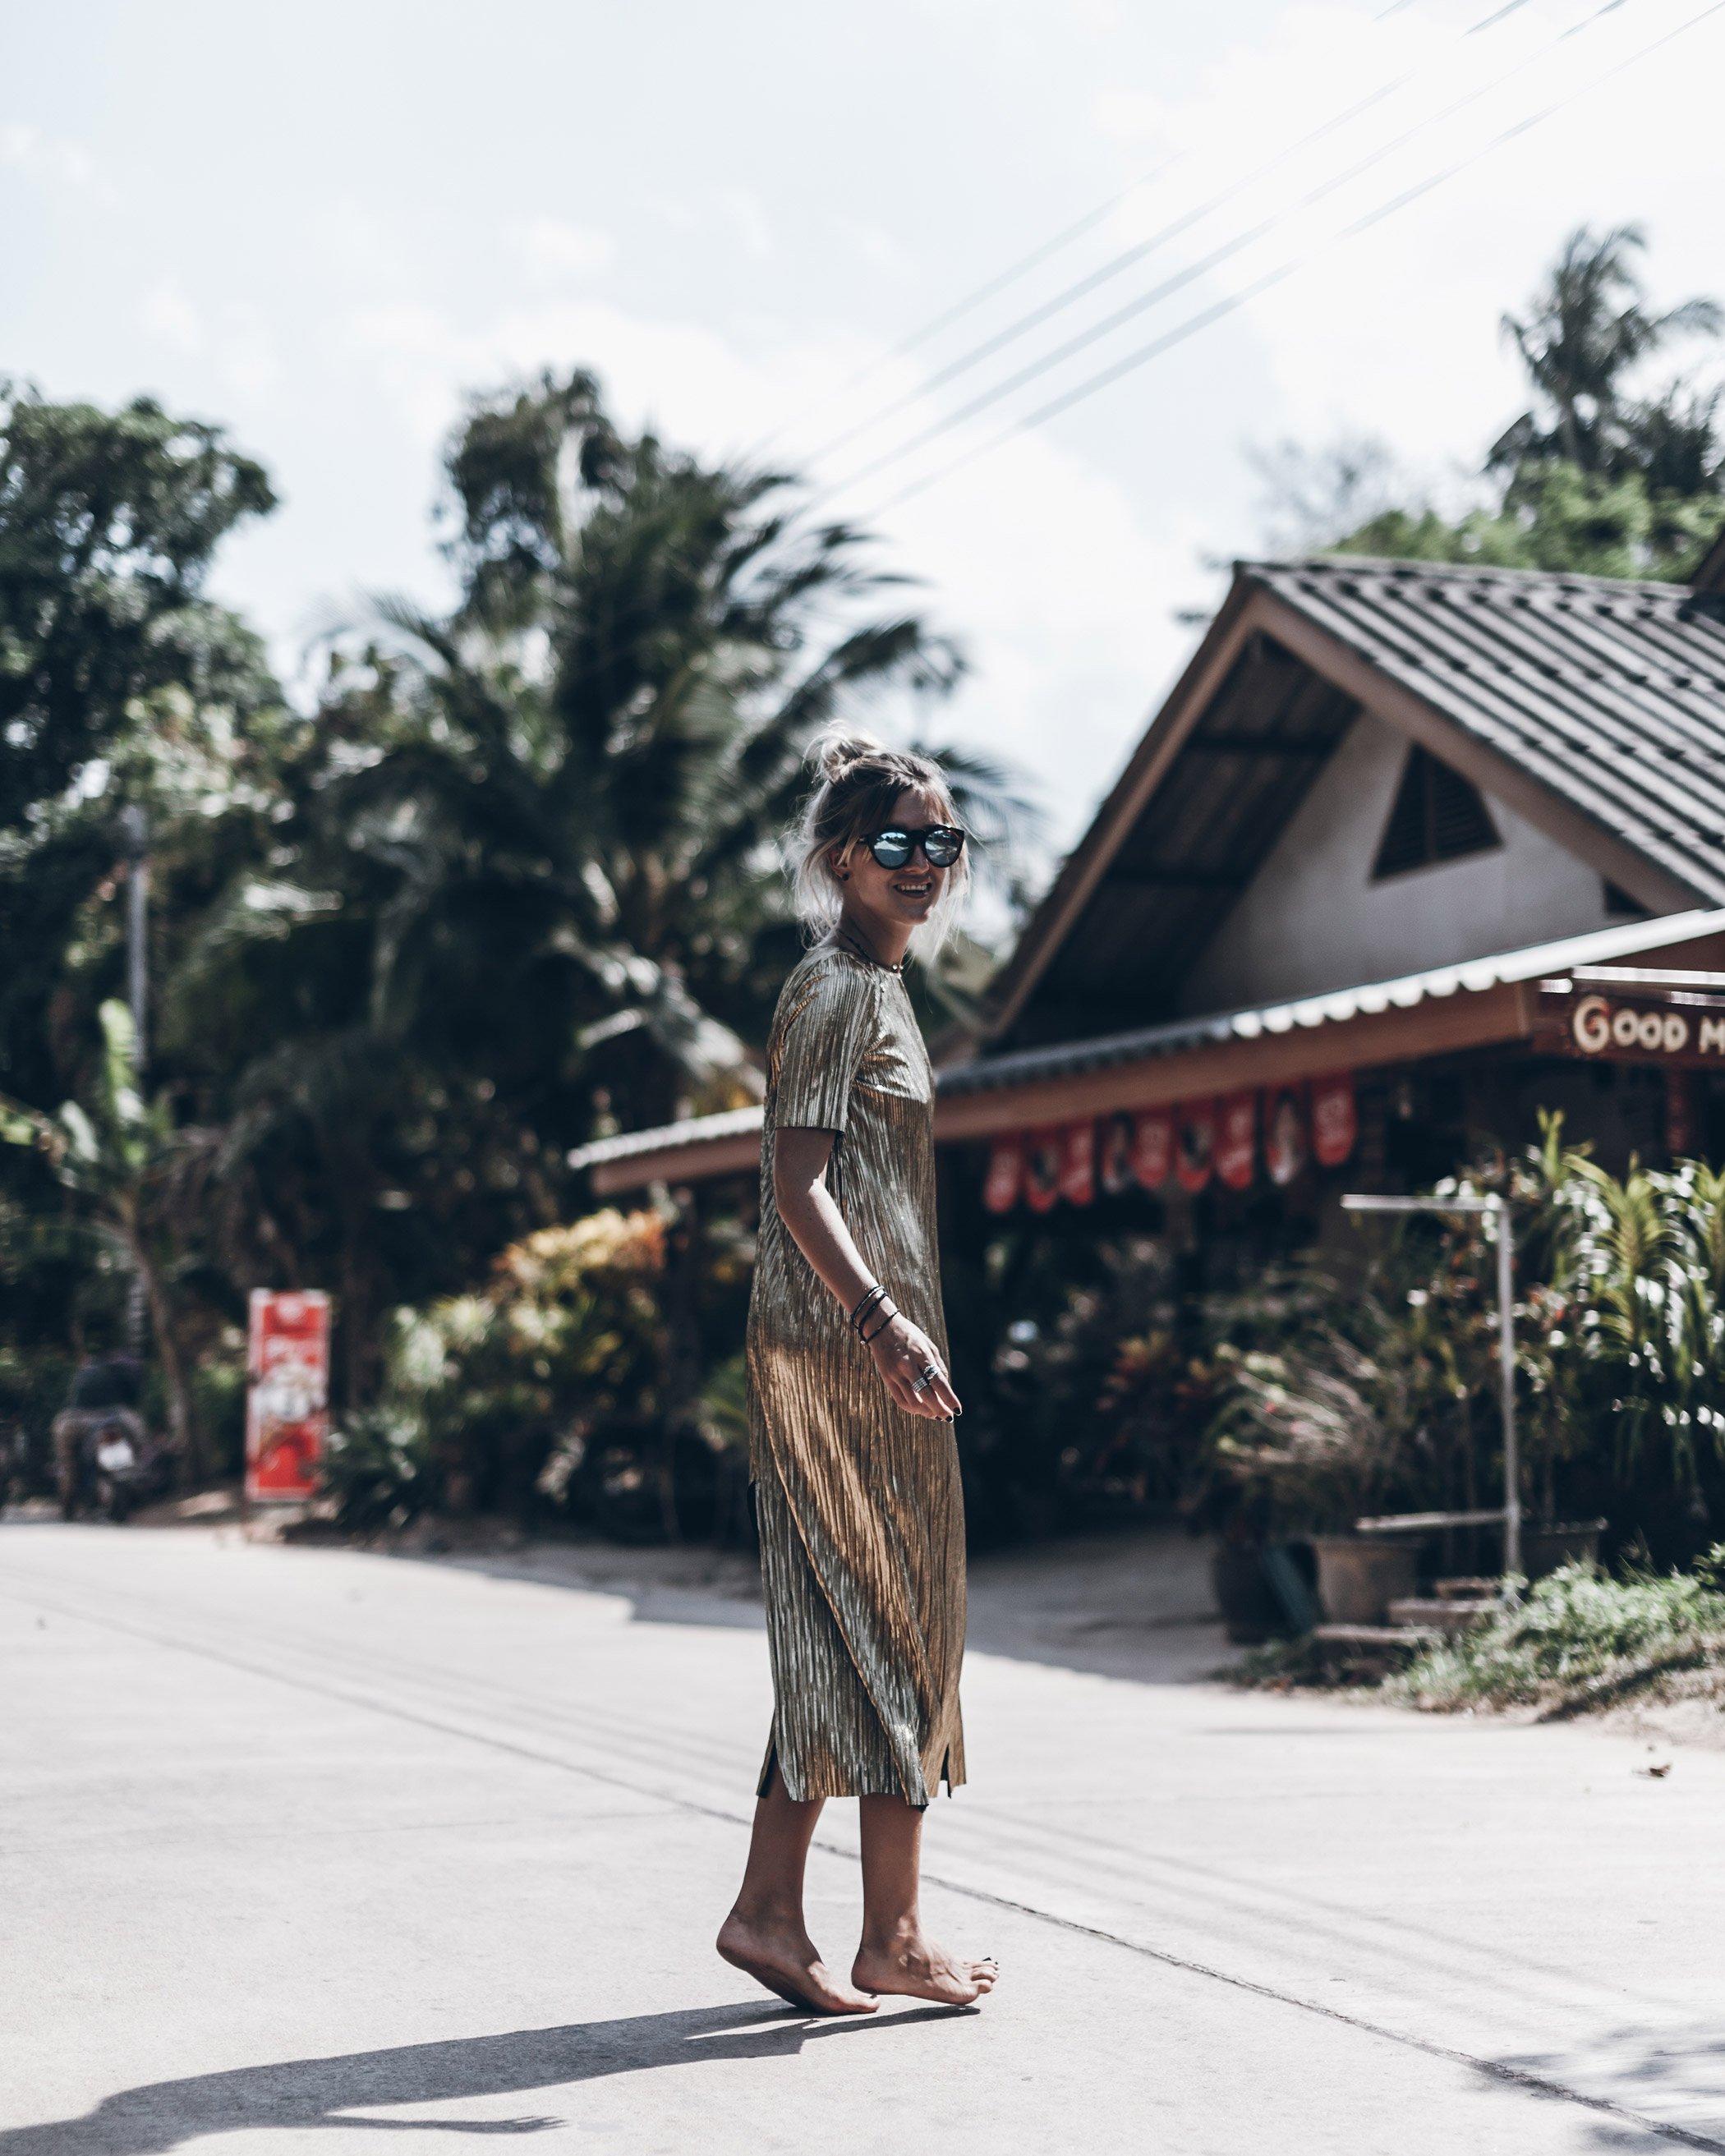 mikuta-koh-jum-thailand-57